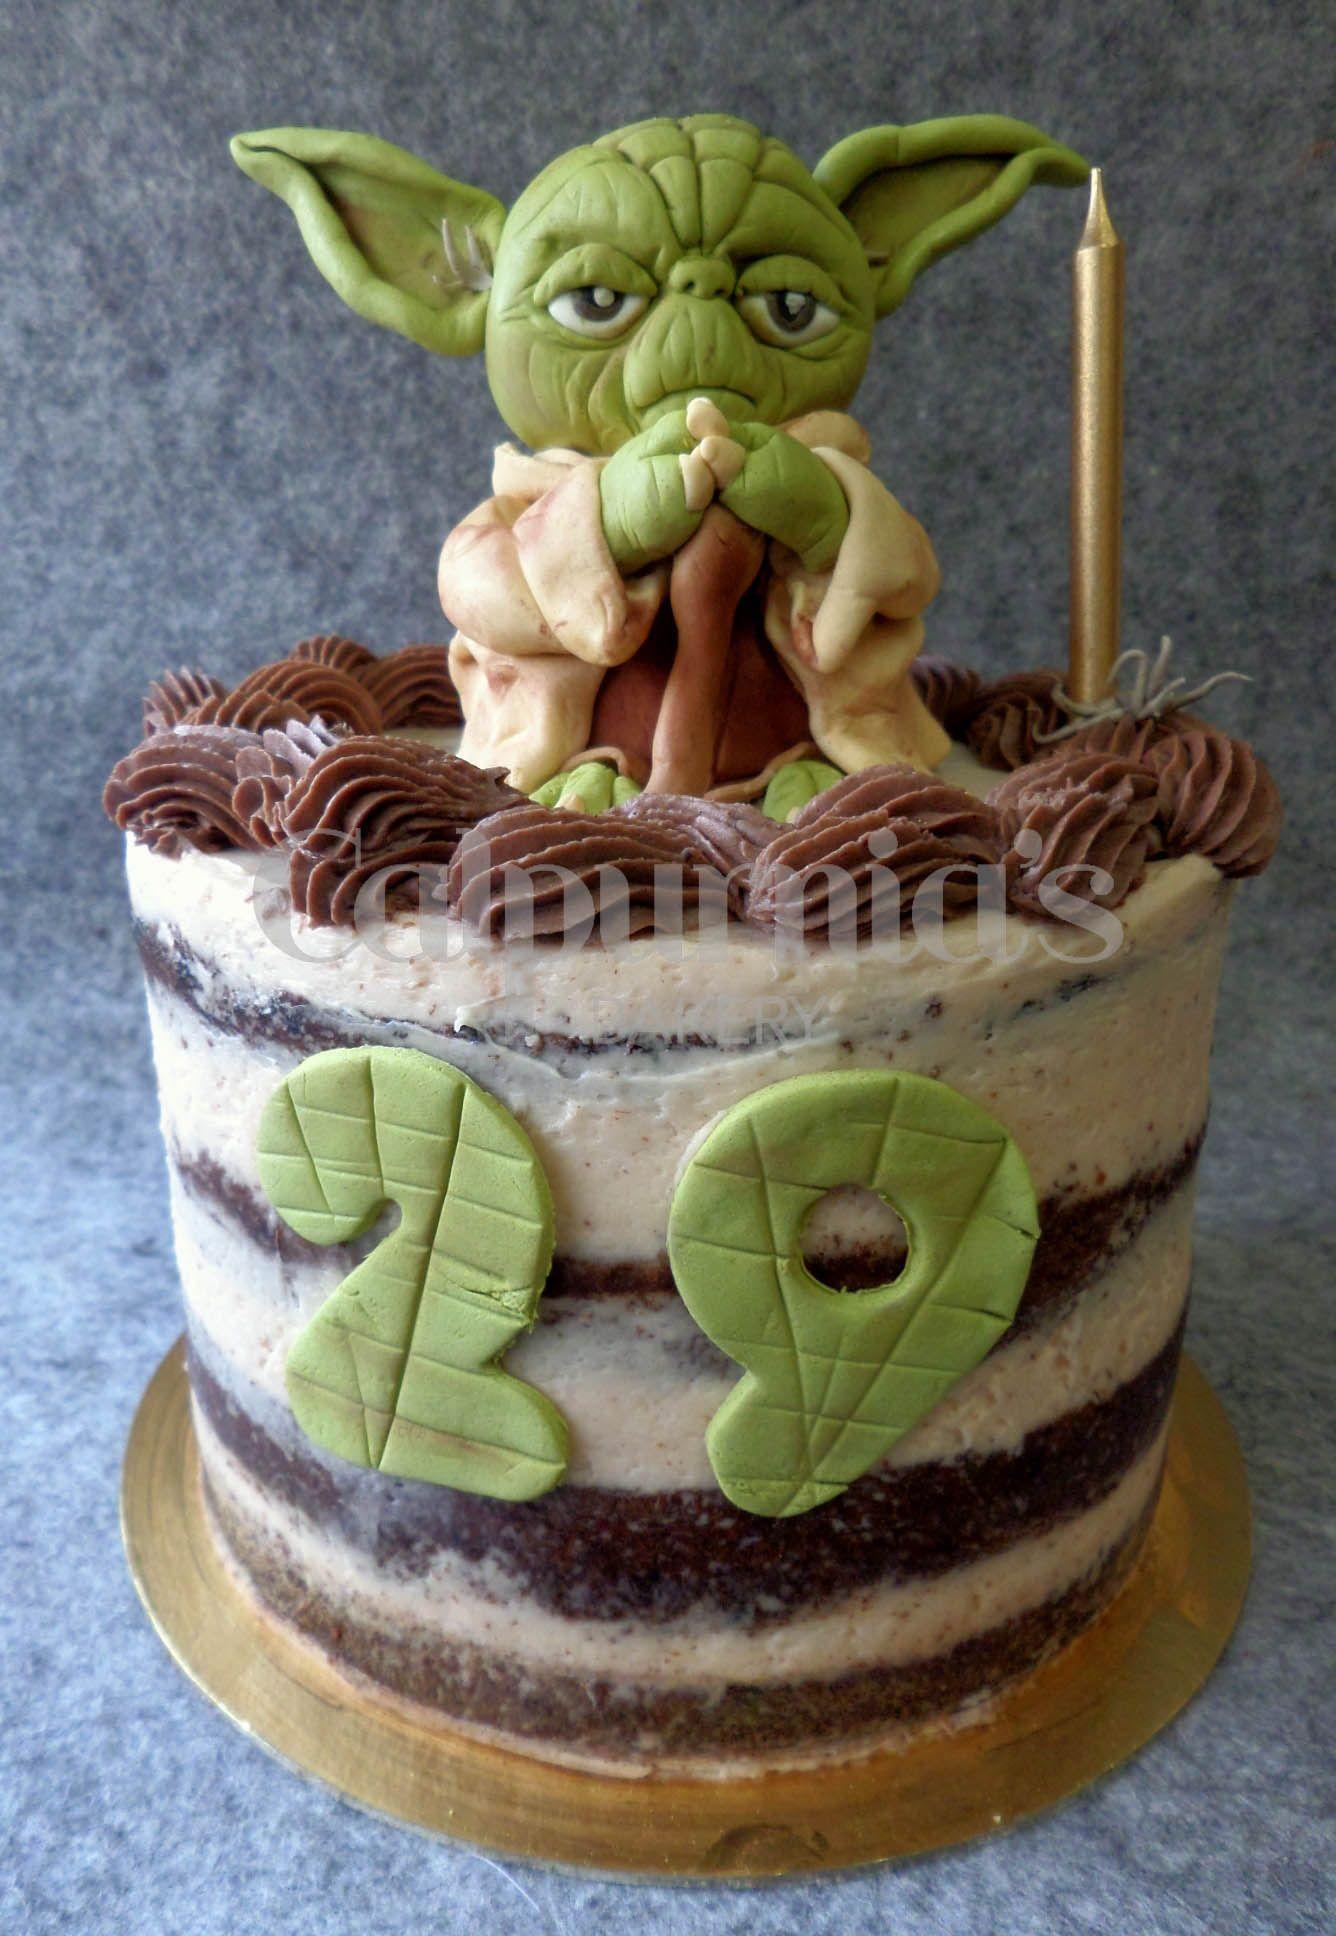 Star Wars Yoda Naked Cake Chocolate Y Fresas Smash Cakes